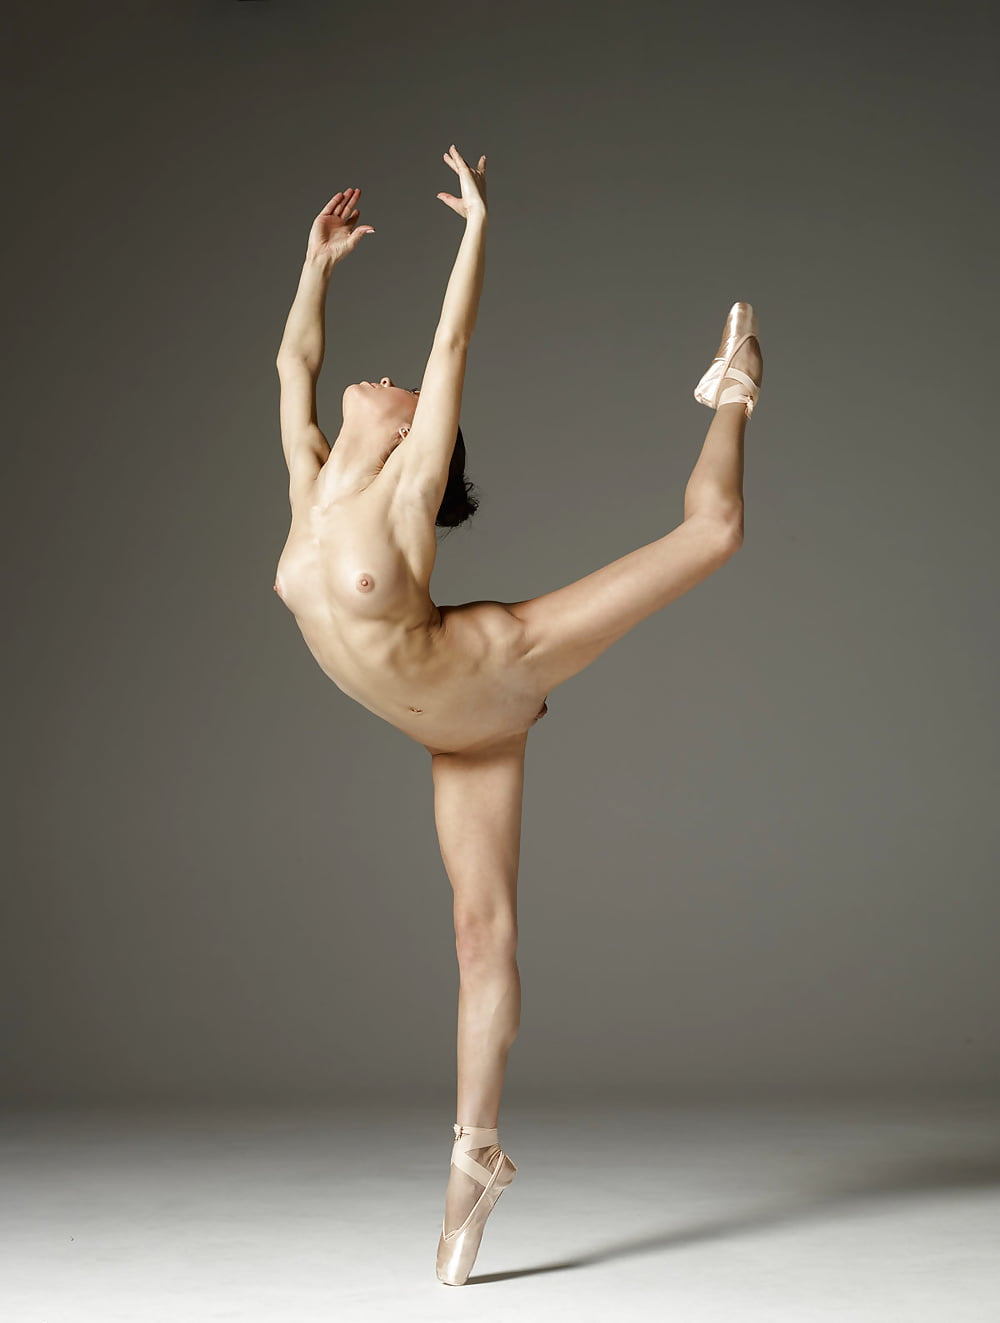 Фото голой балерины у каната